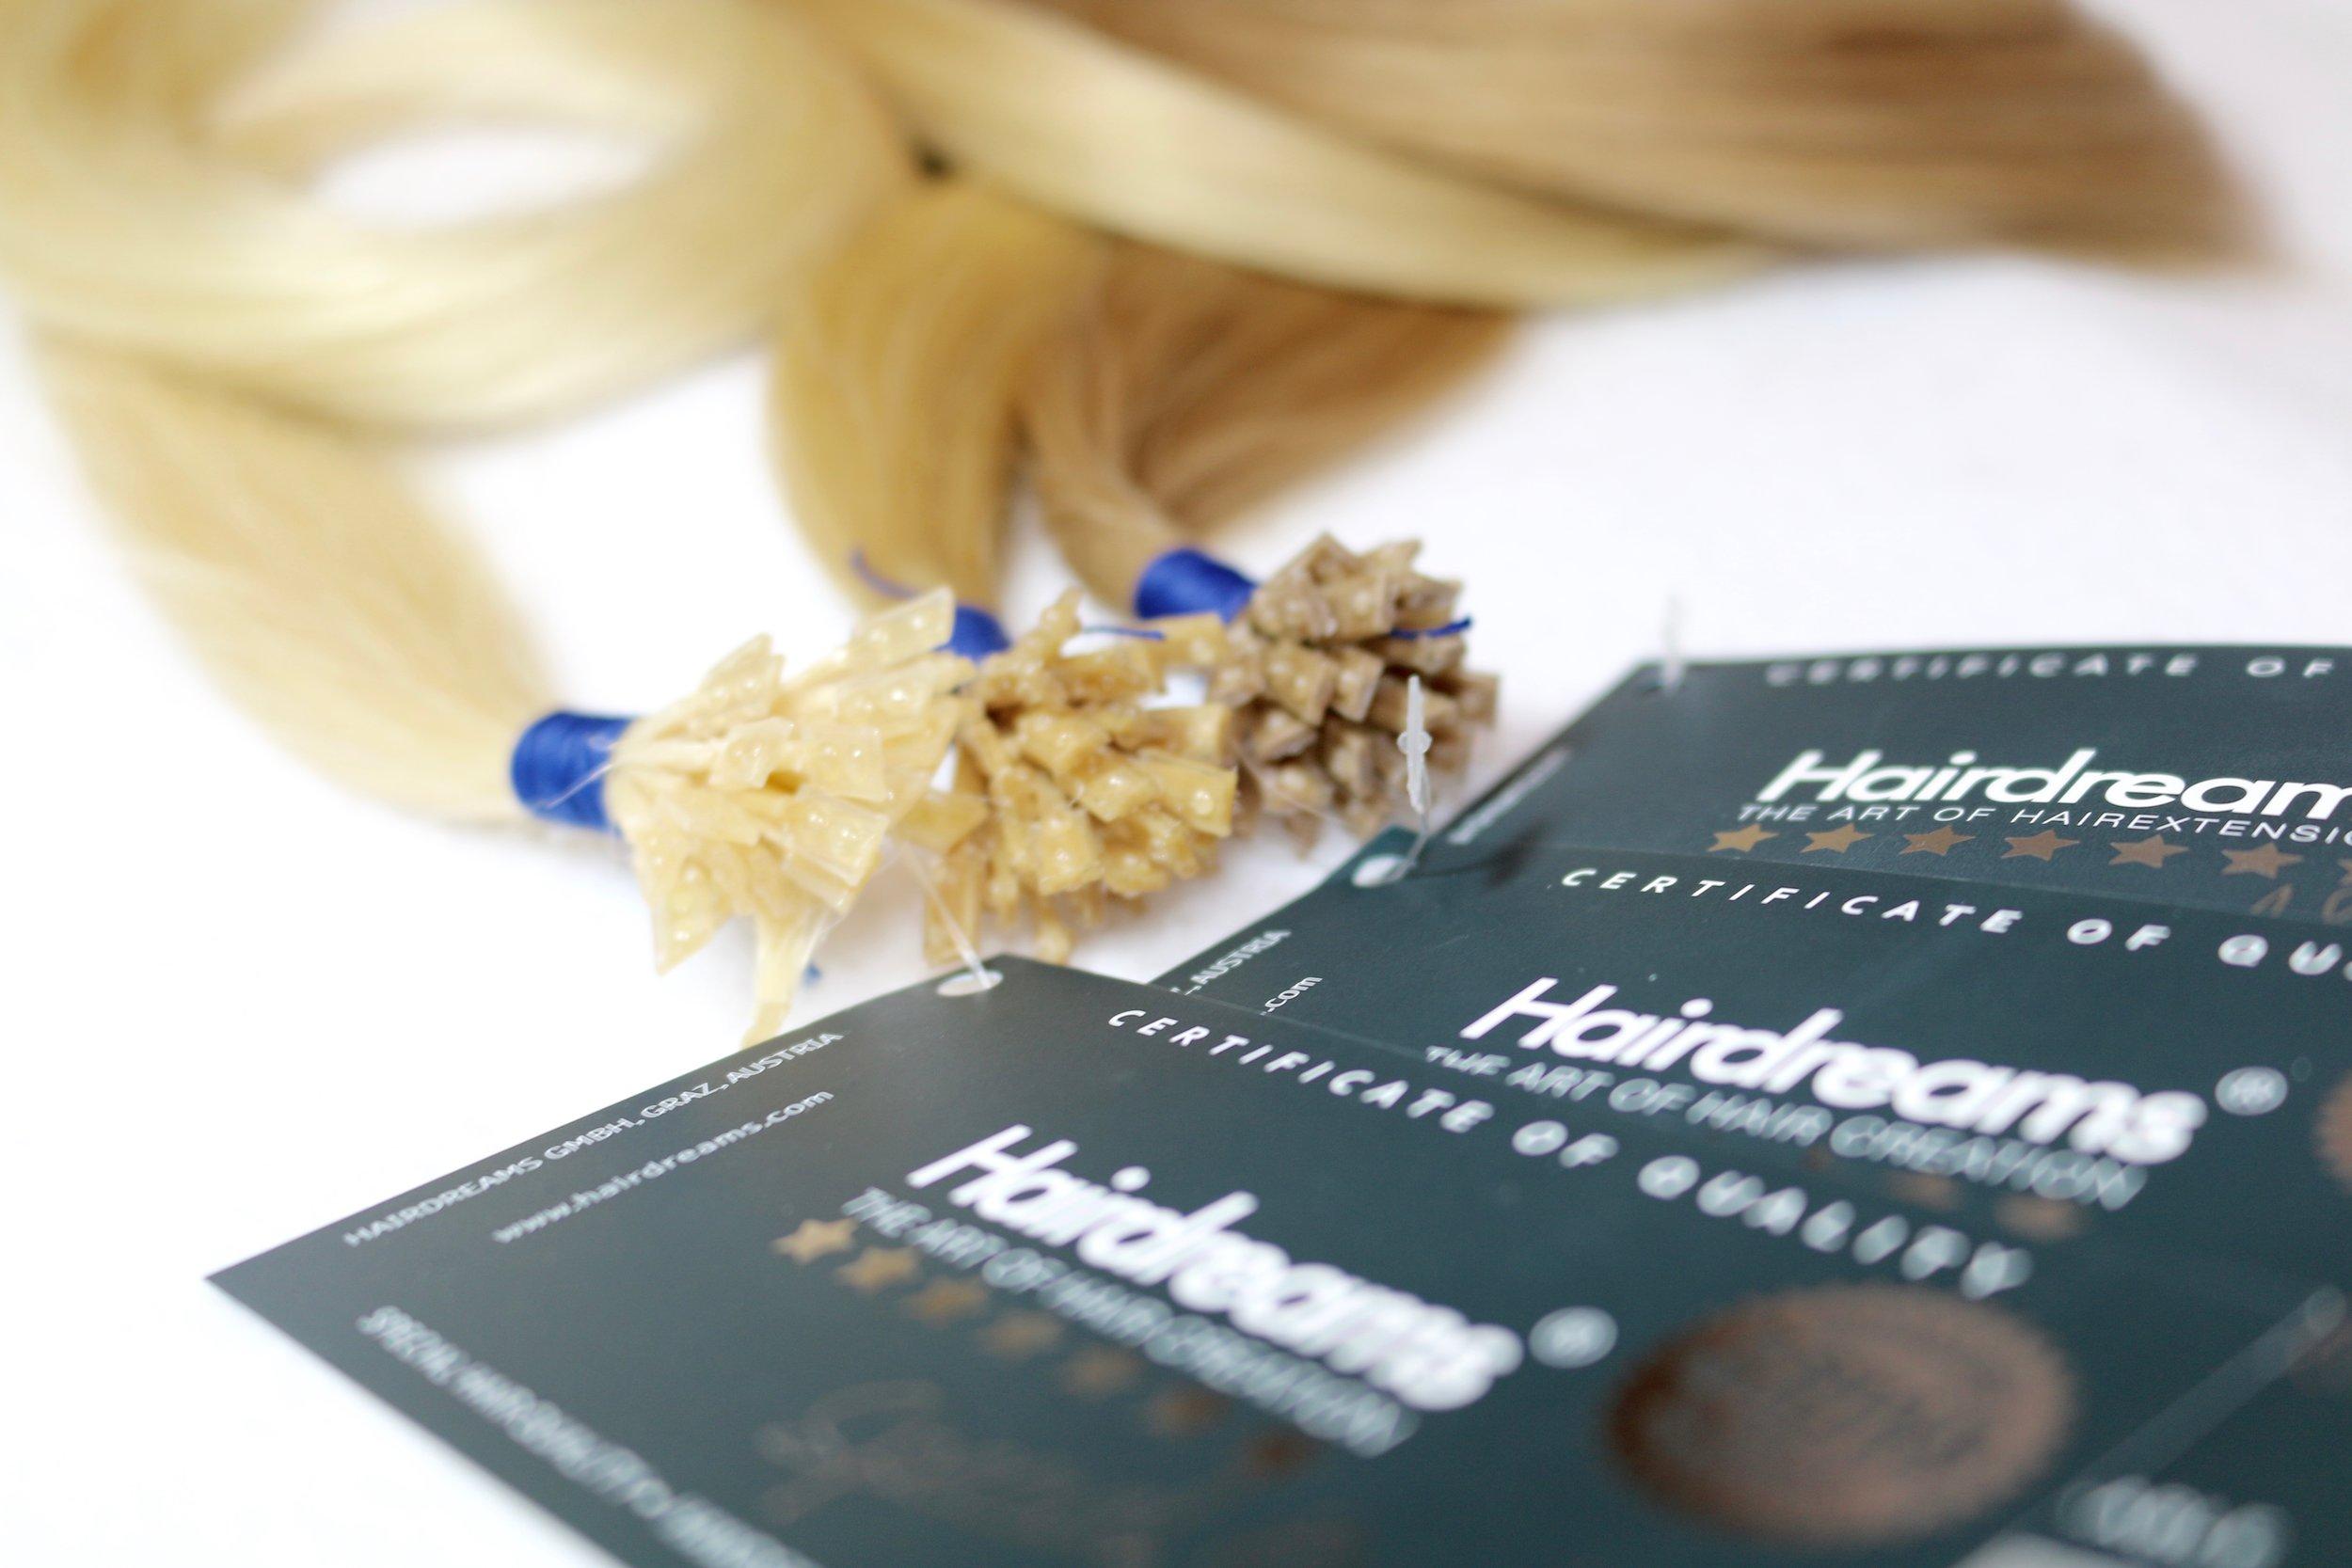 hairdreams strands 3.jpg